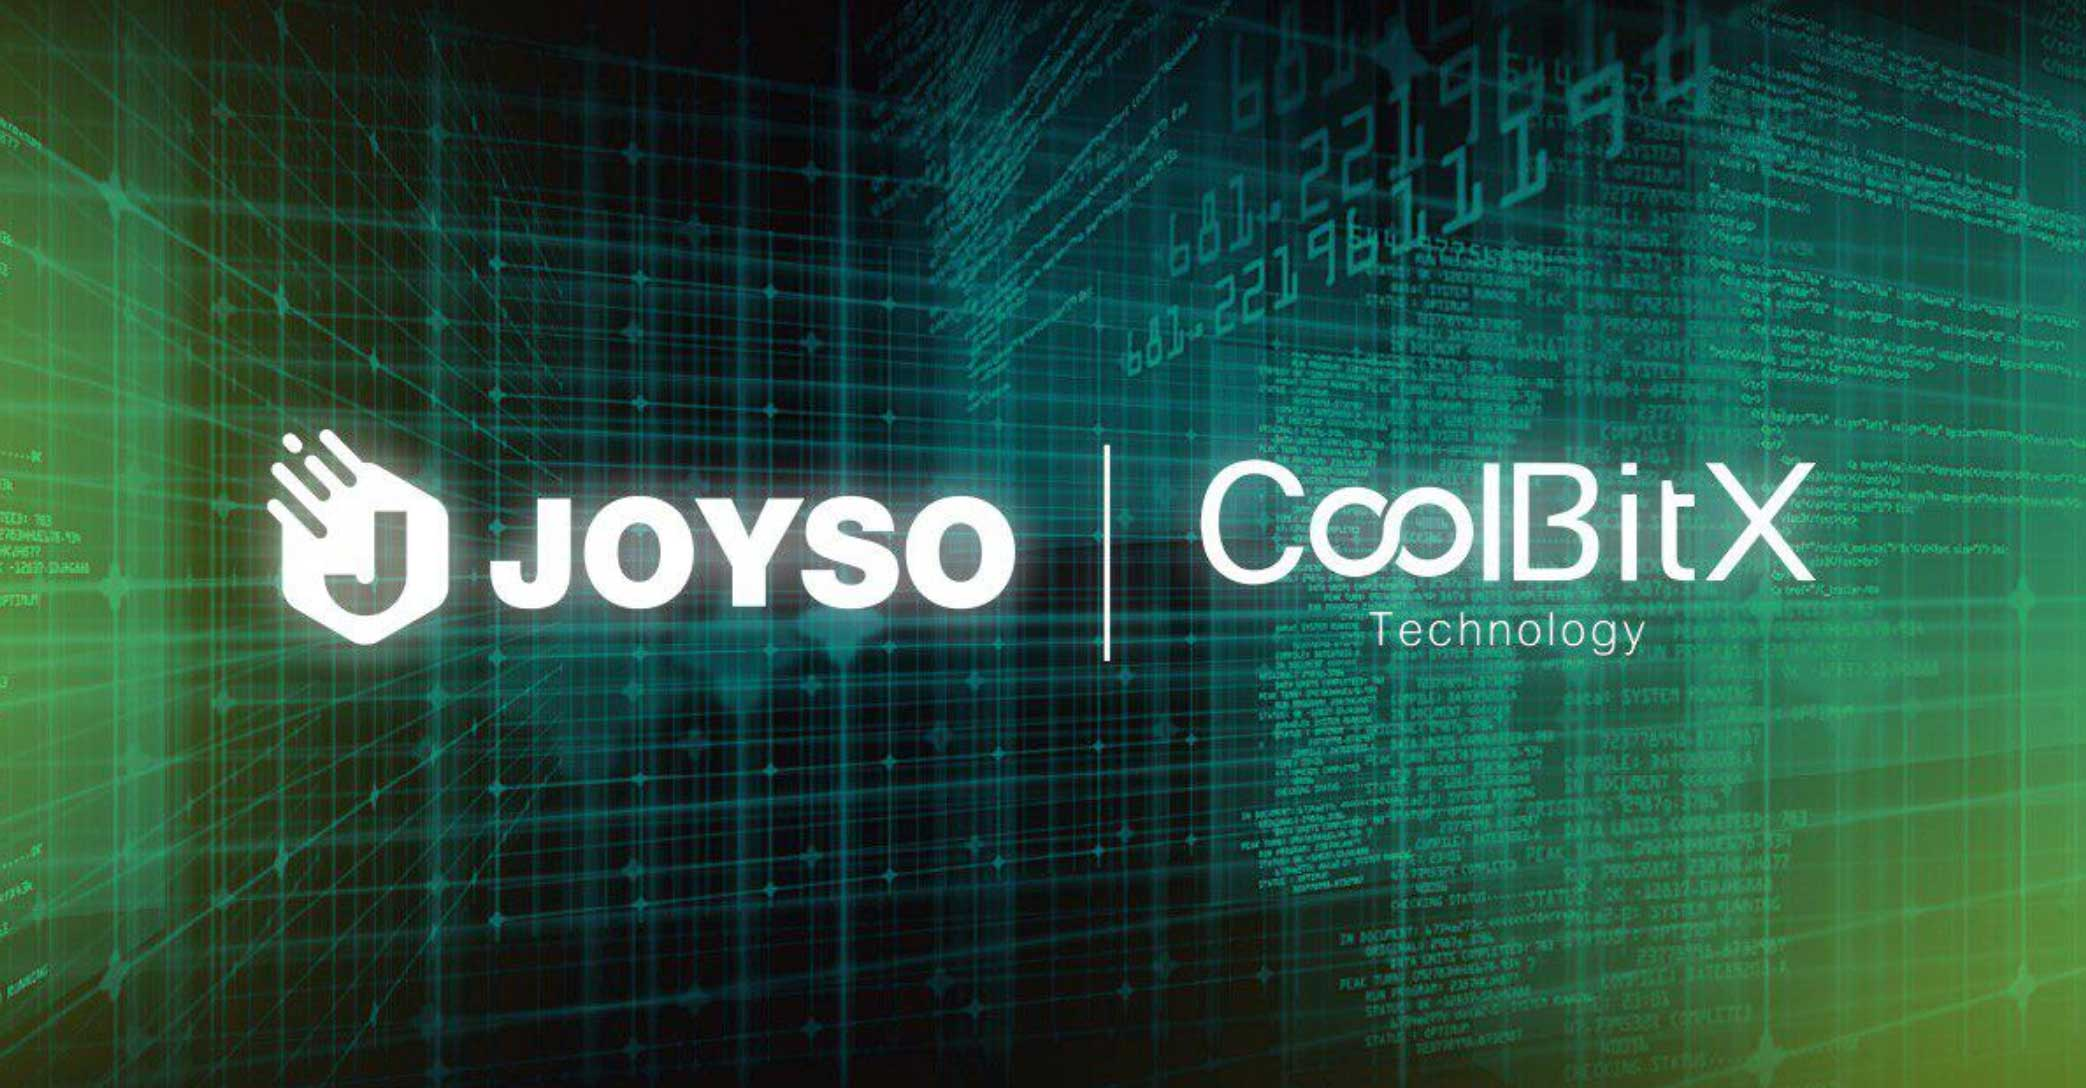 CoolBitX Partnership with JOYSO the Crypto Exchange